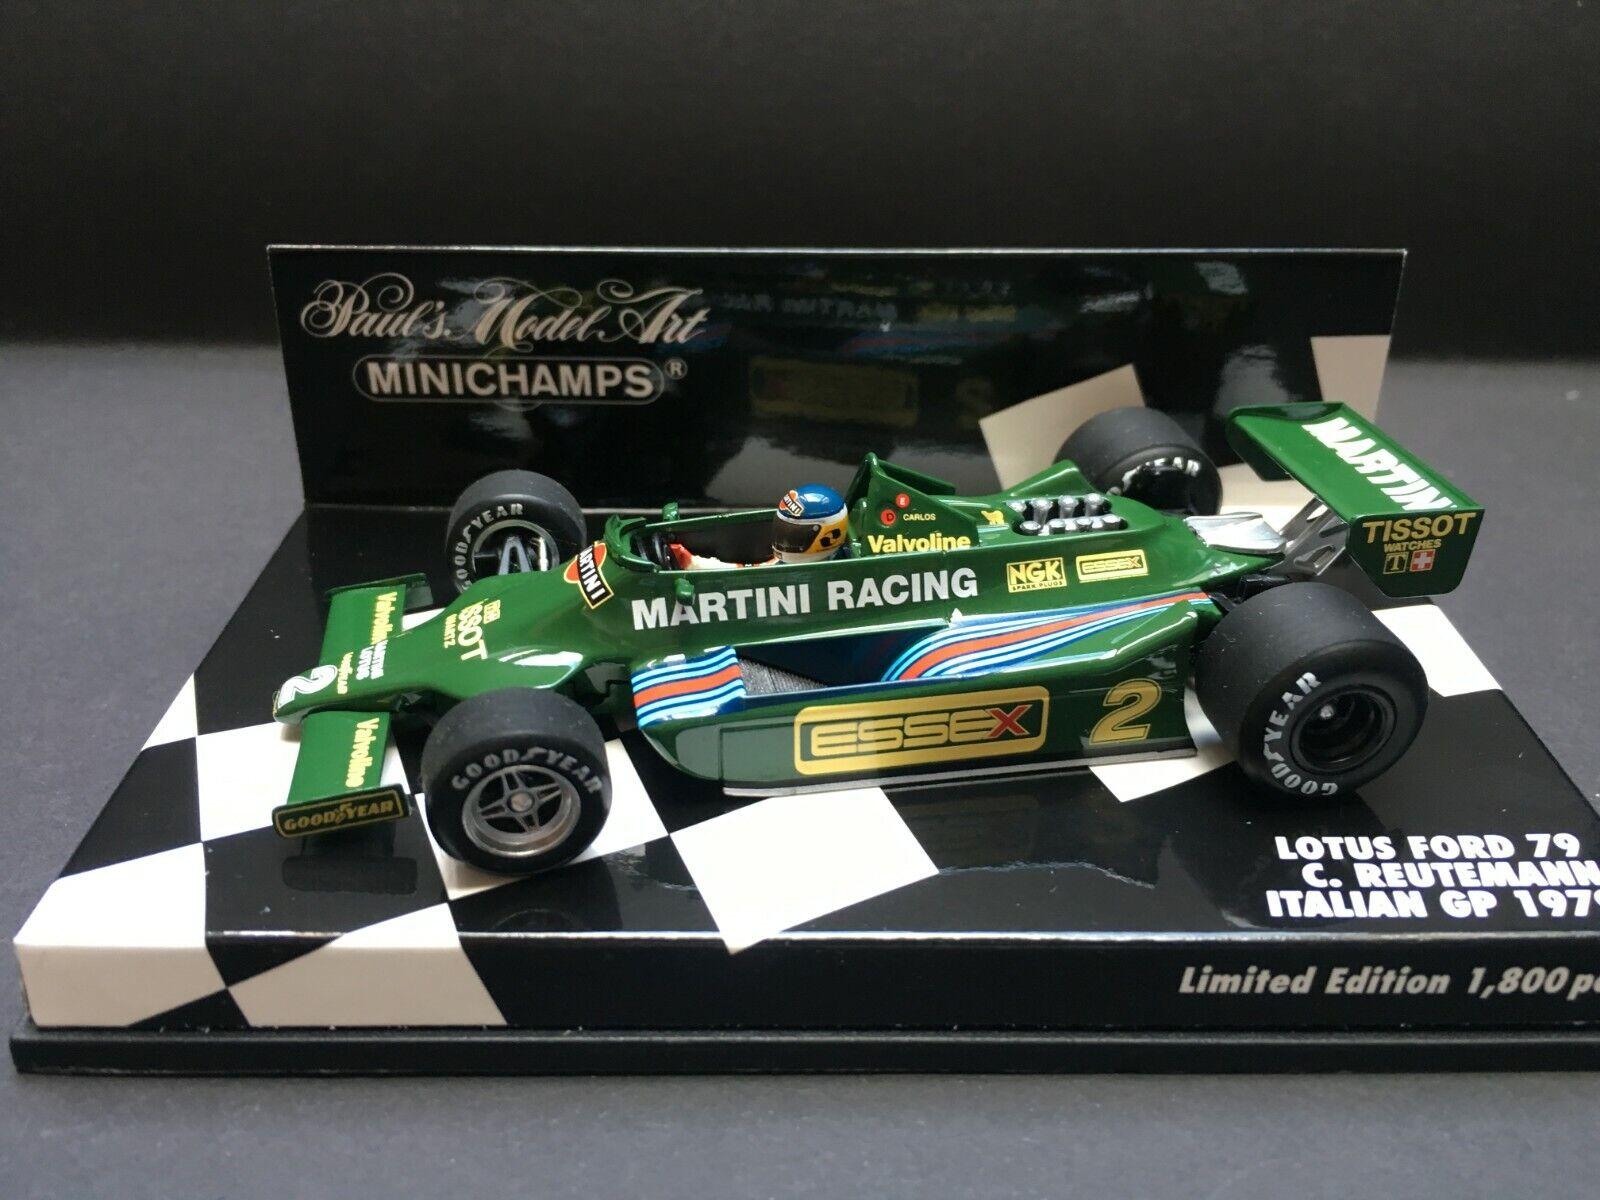 Minichamps - Carlos Reutemann- Lotus - 79 - 1 43 43 43 - 1979 - Italian GP 522